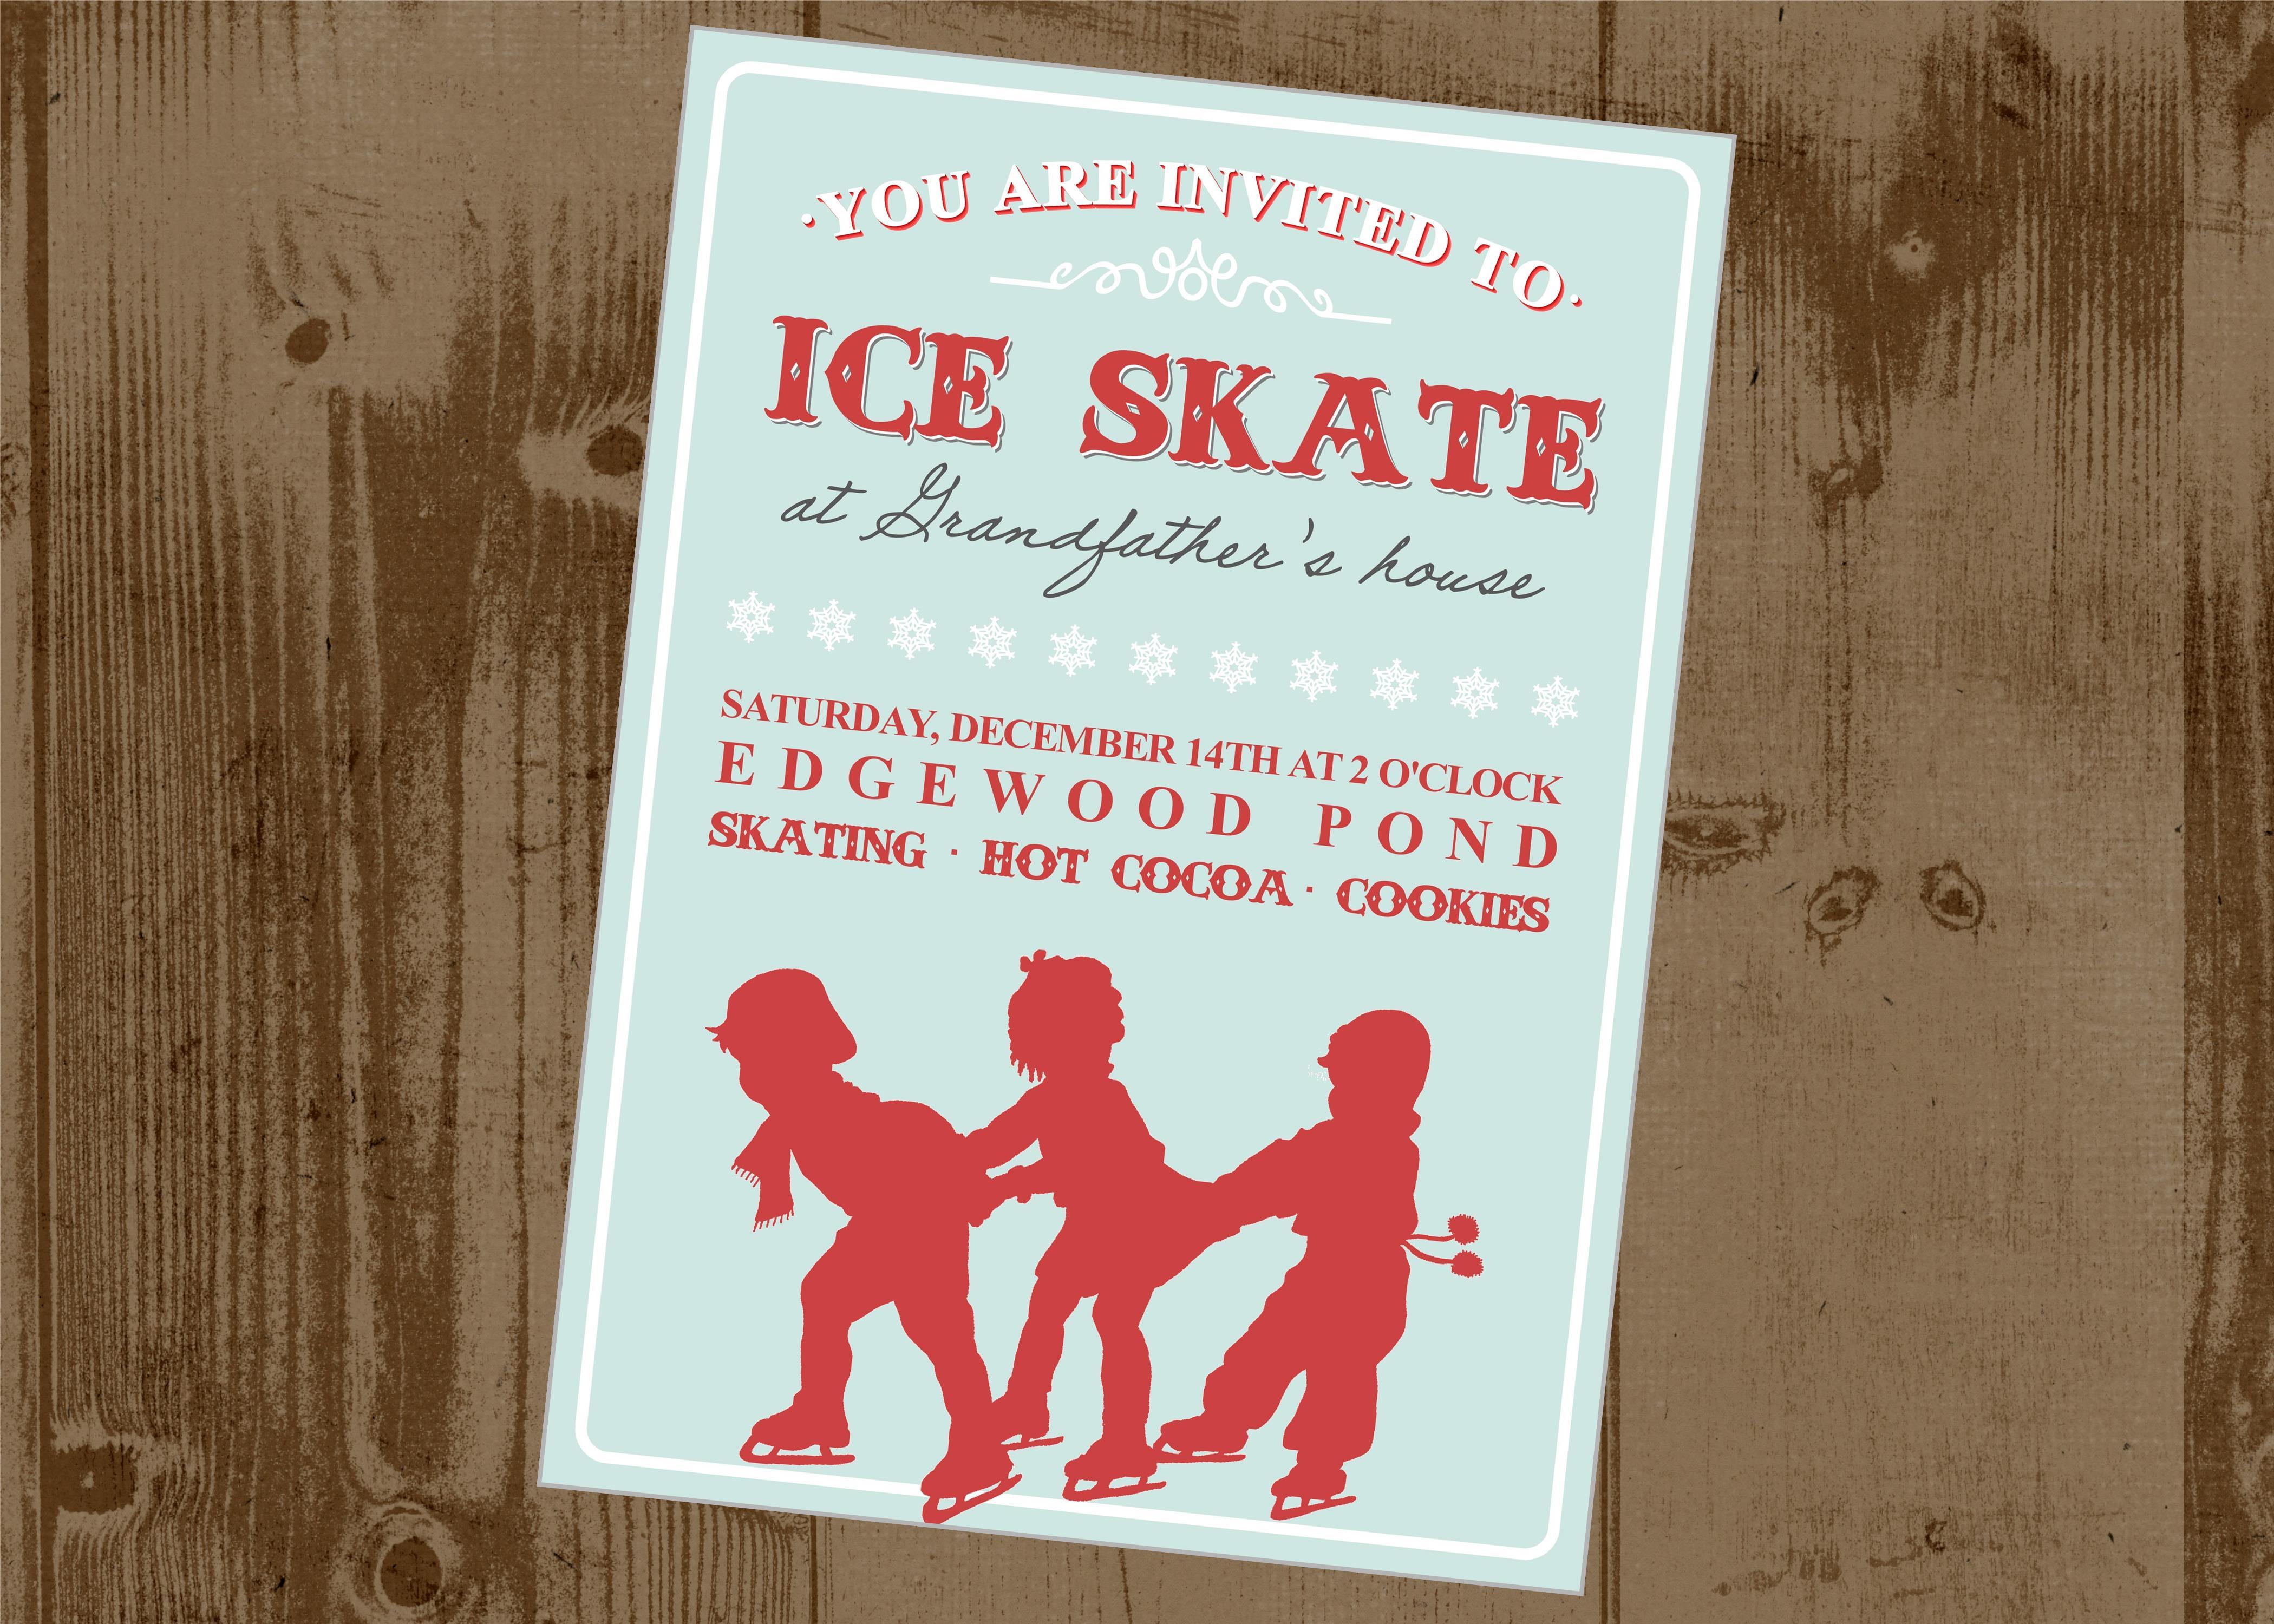 Ice Skating Printable Party Invitation Vintage Style | The Homespun ...